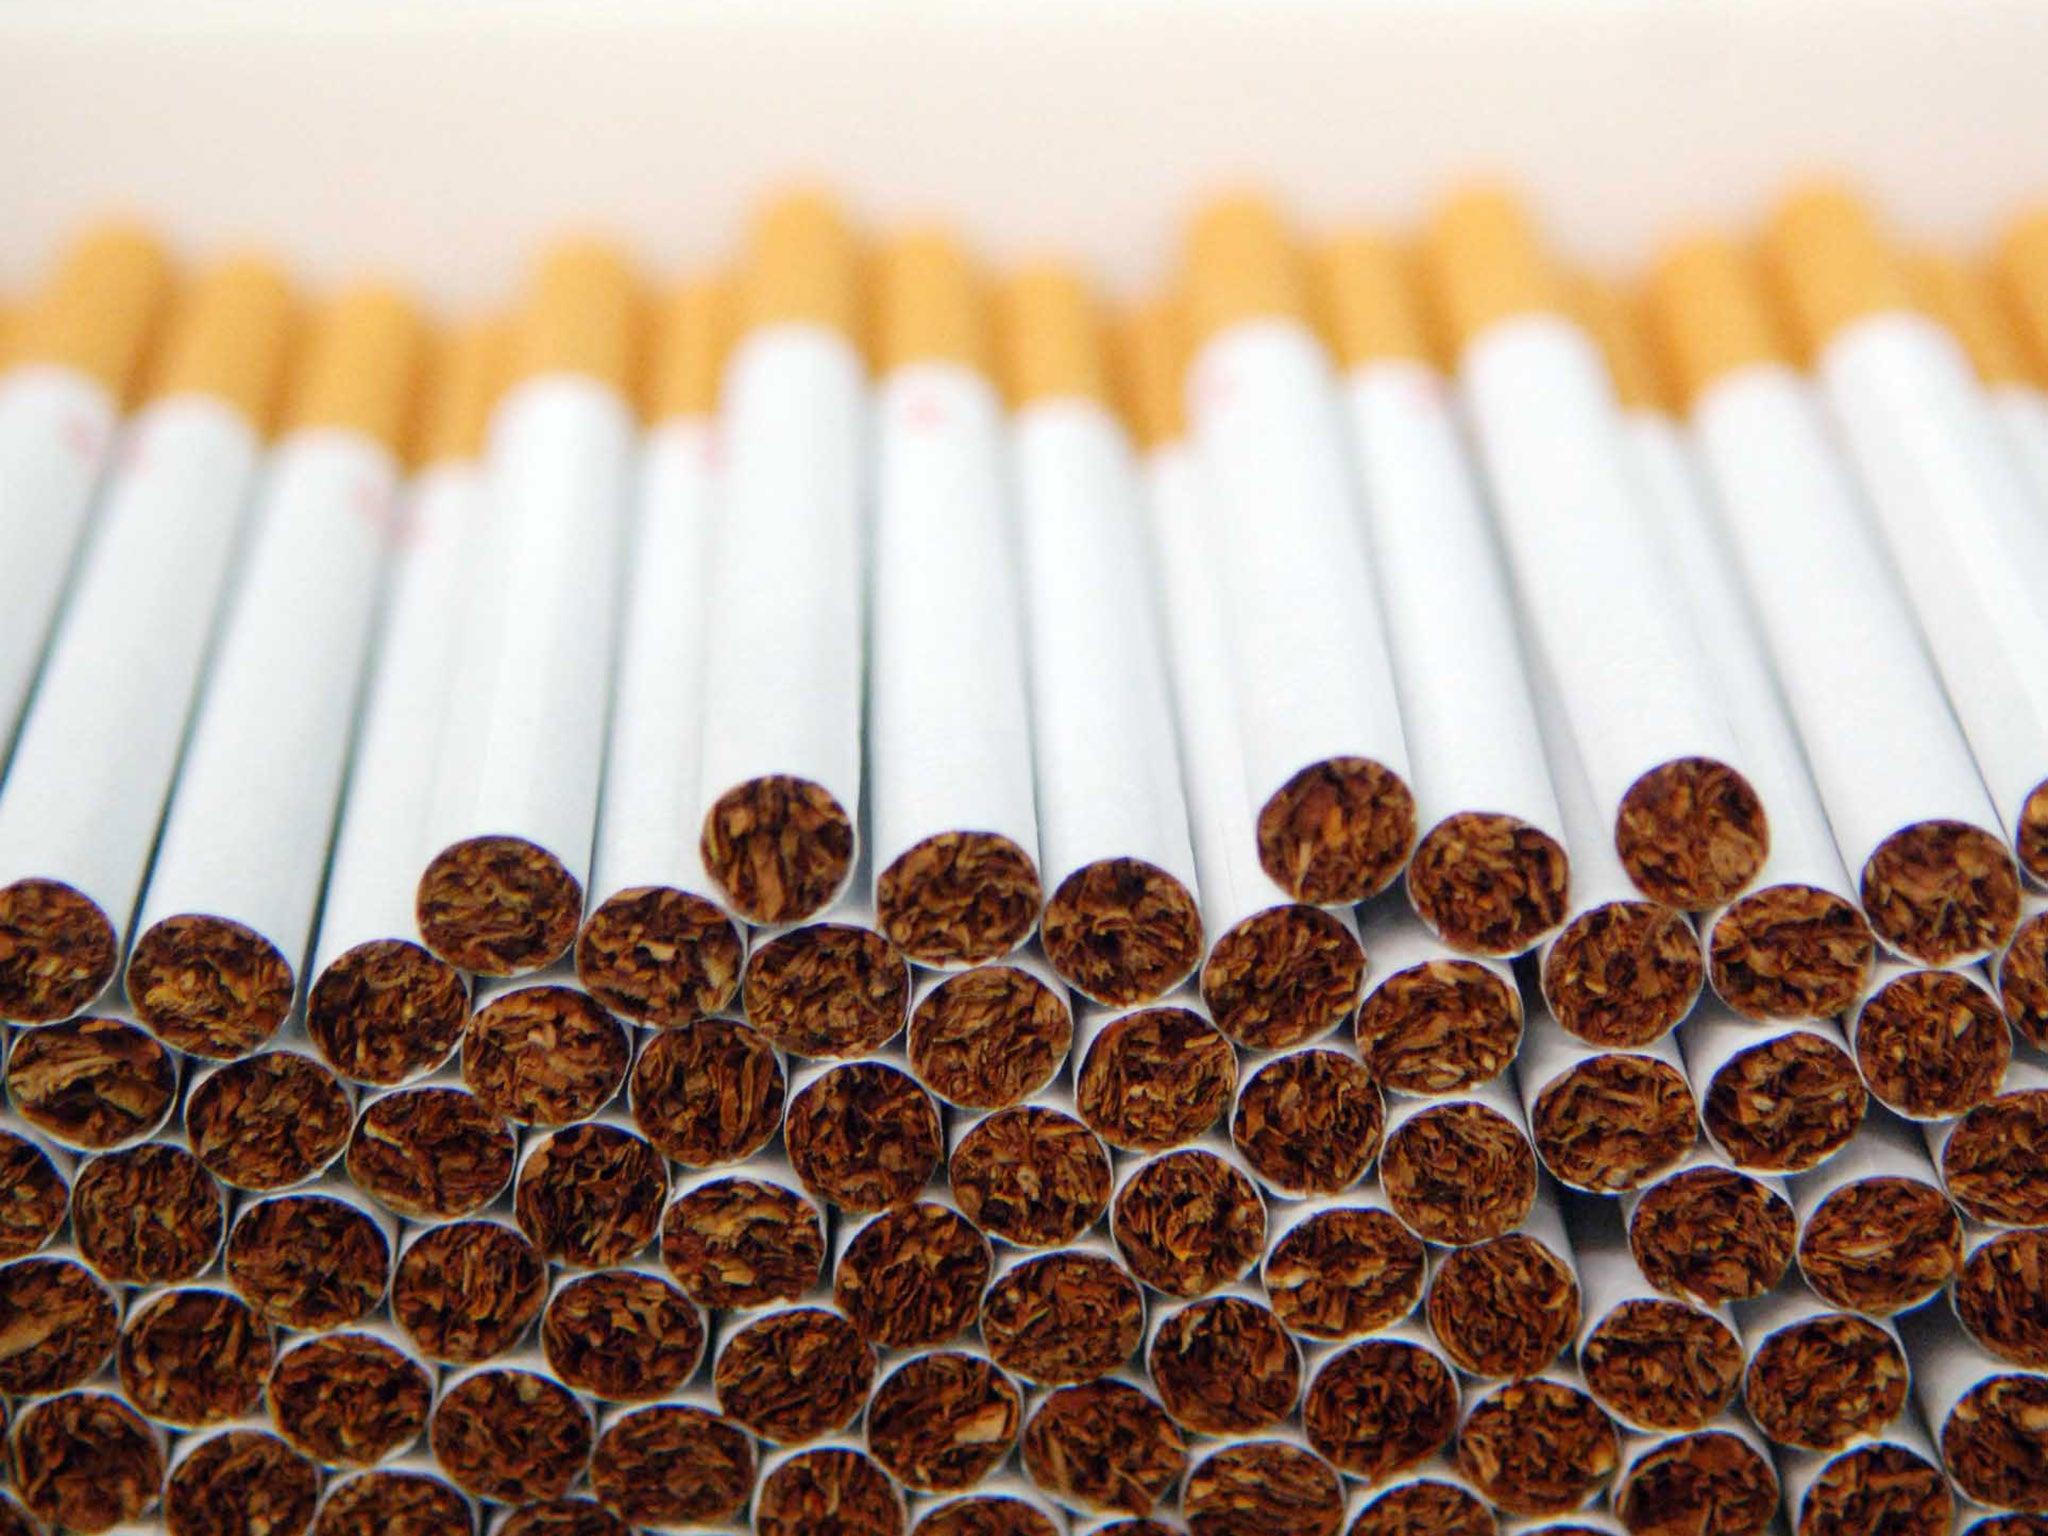 Cigarette Companies Lose Last Minute Bid To Stop Plain